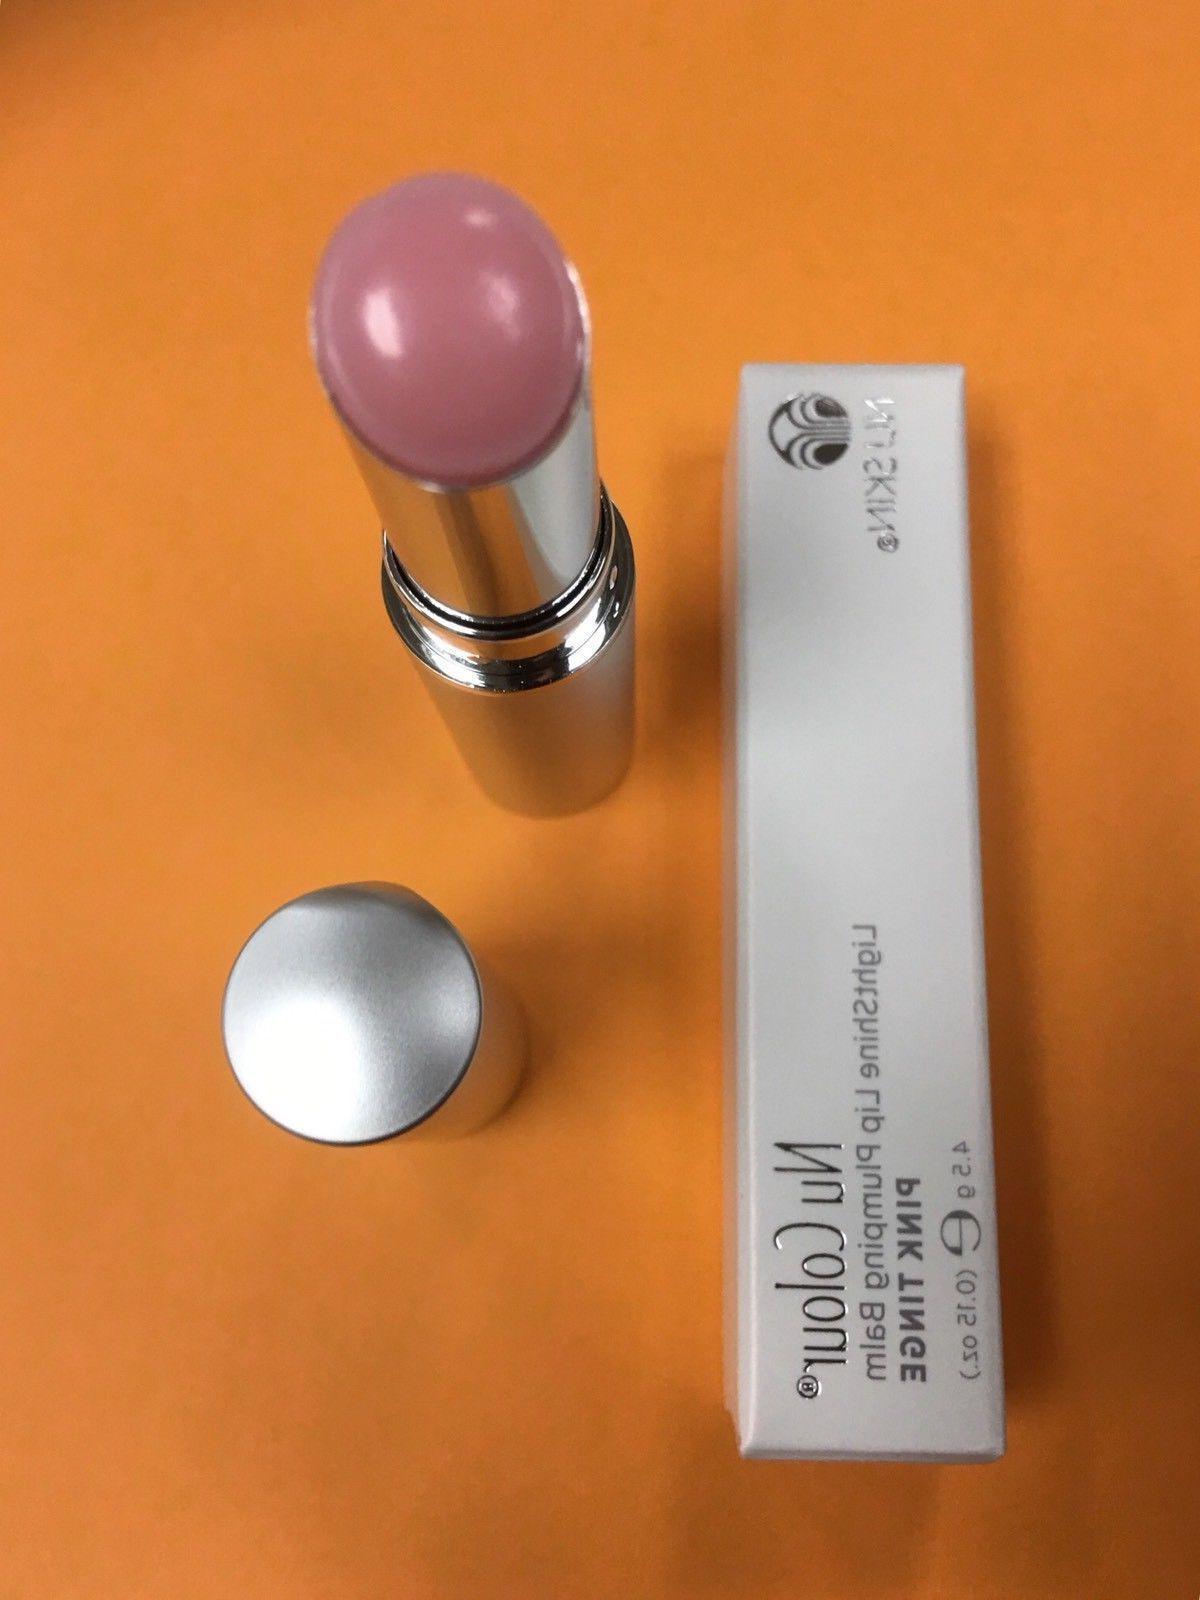 NEW Skin Colour LightShine Lip Plumping Balm 0.15 oz